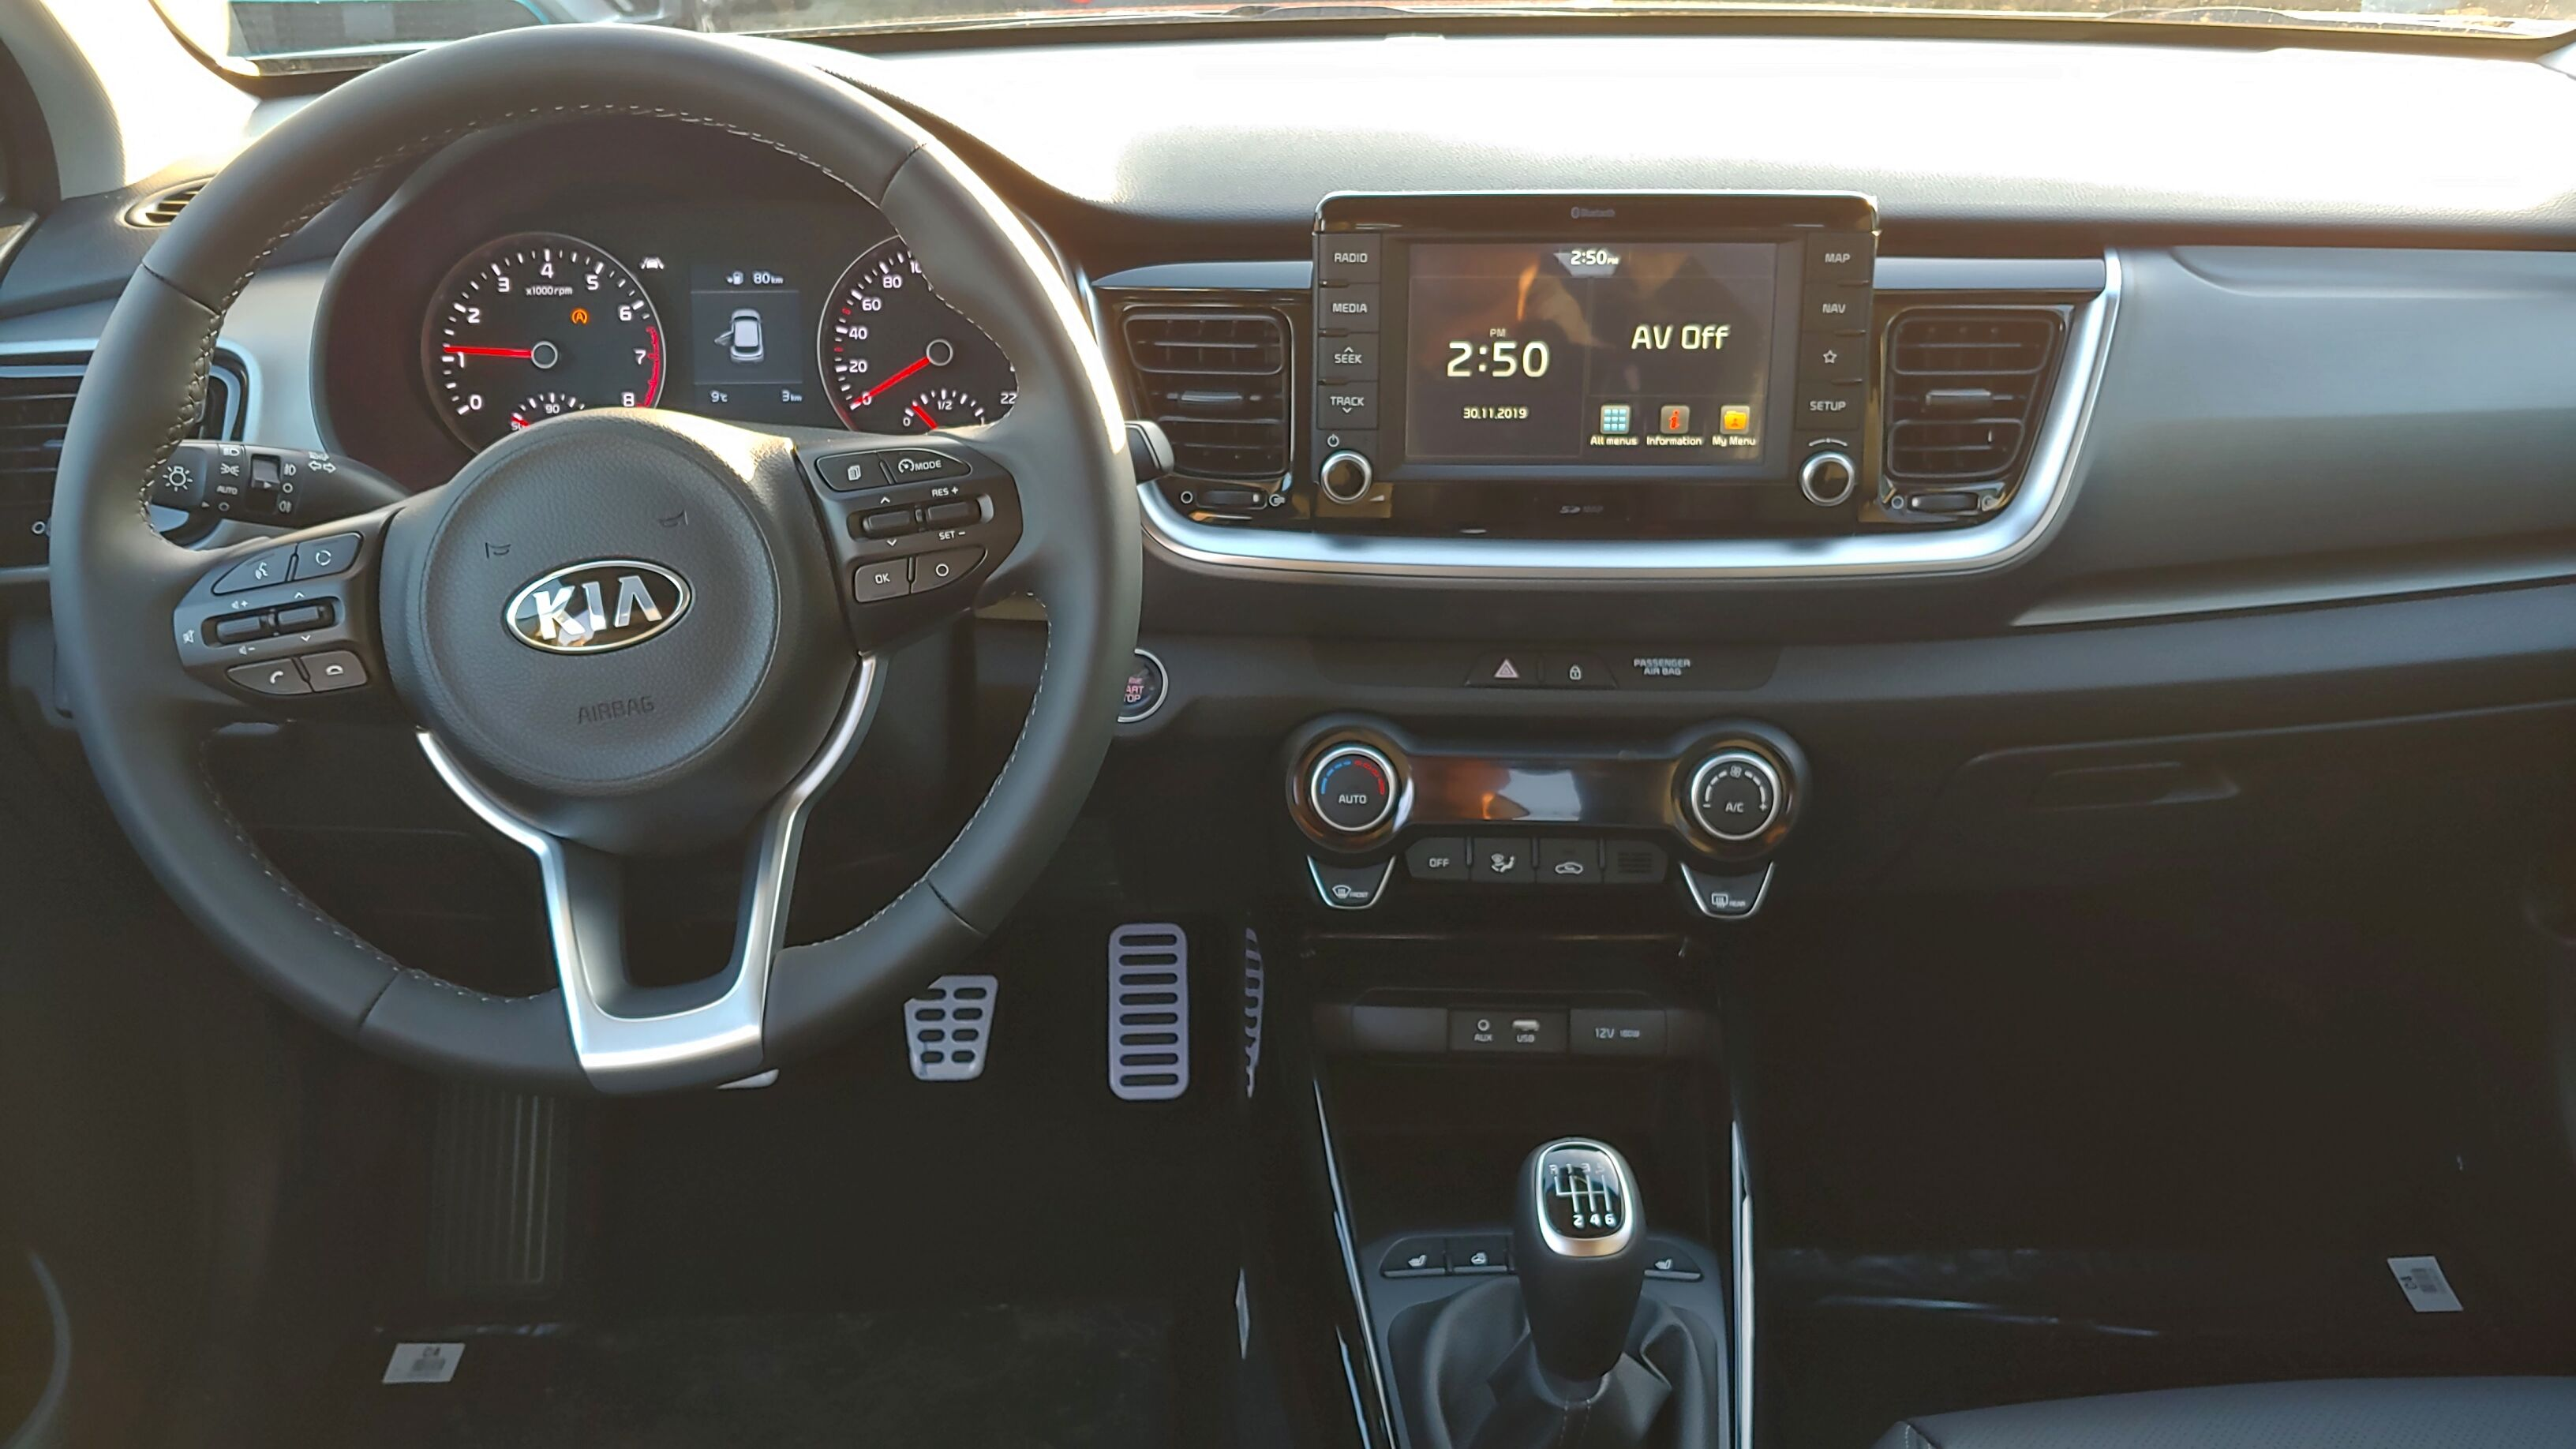 Kia Stonic 1.0 T Sense ISG / Leder /GPS / Camera | 7 jaar garantie 11/13